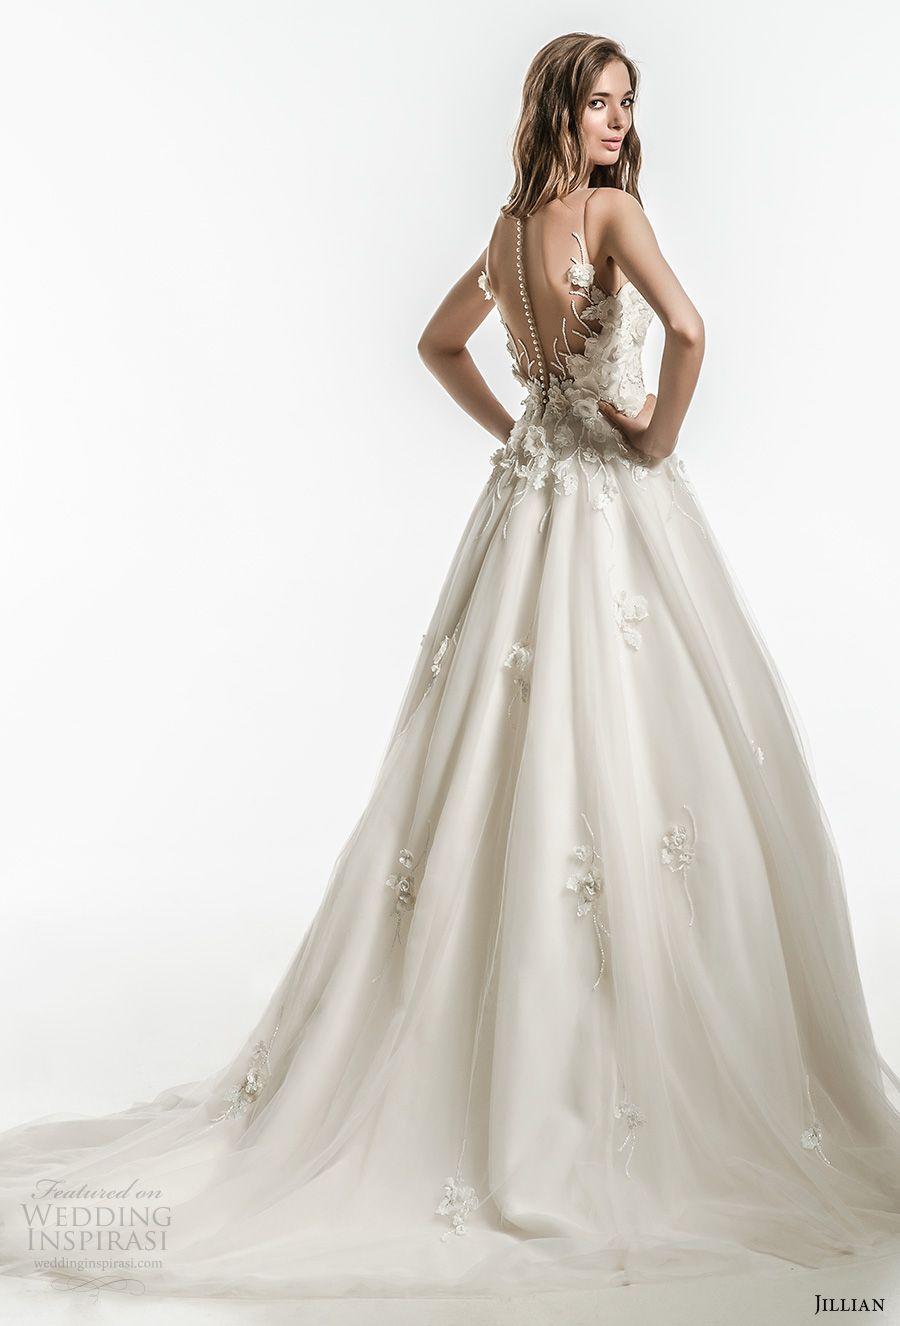 jillian 2018 bridal sleeveless illusion jewel sweetheart neckline heavily embellished bodice romantic a line wedding dress sheer button back chapel train (11) bv -- Jillian 2018 Wedding Dresses